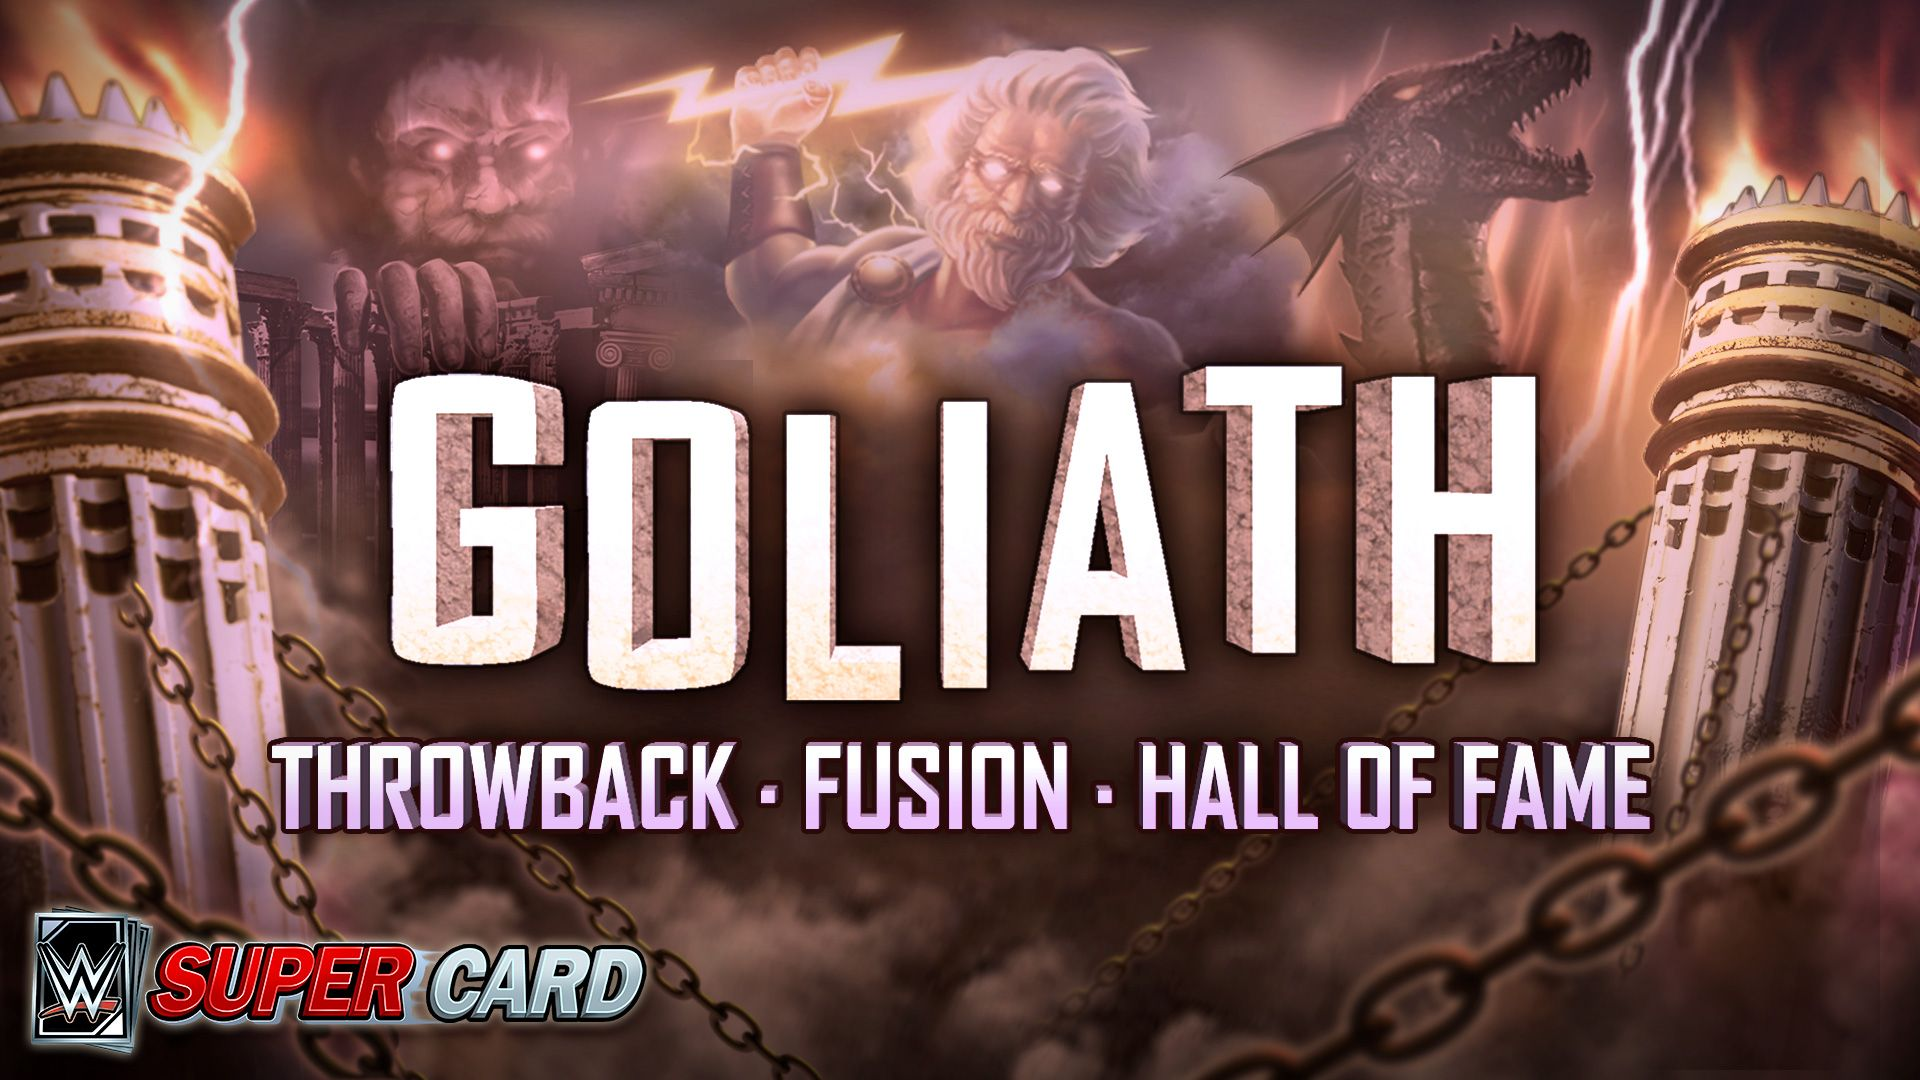 Wwe Supercard News Goliath Cartes Nostalgie Fusion Et Hall Of